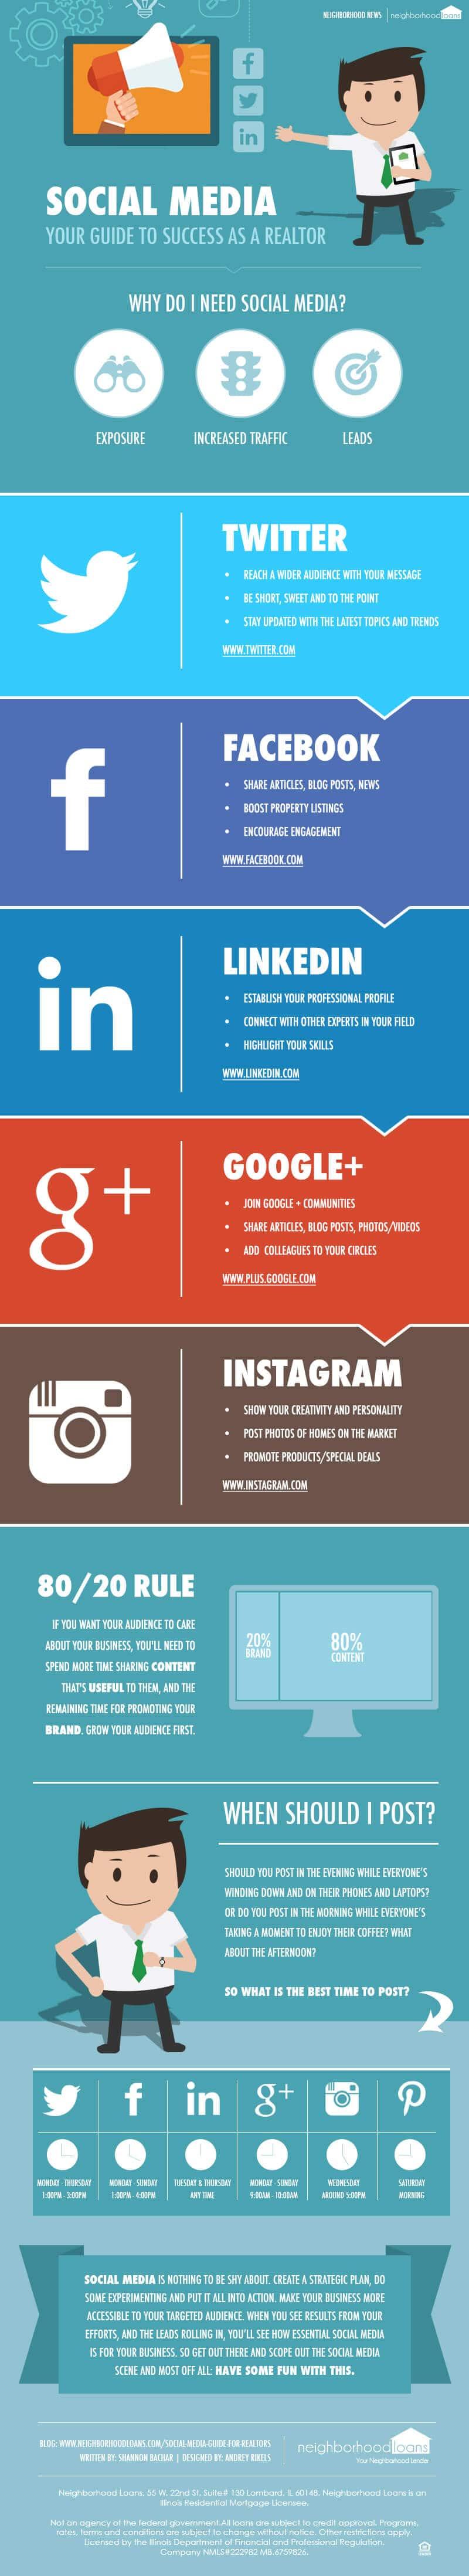 social media guide for realtors infographic